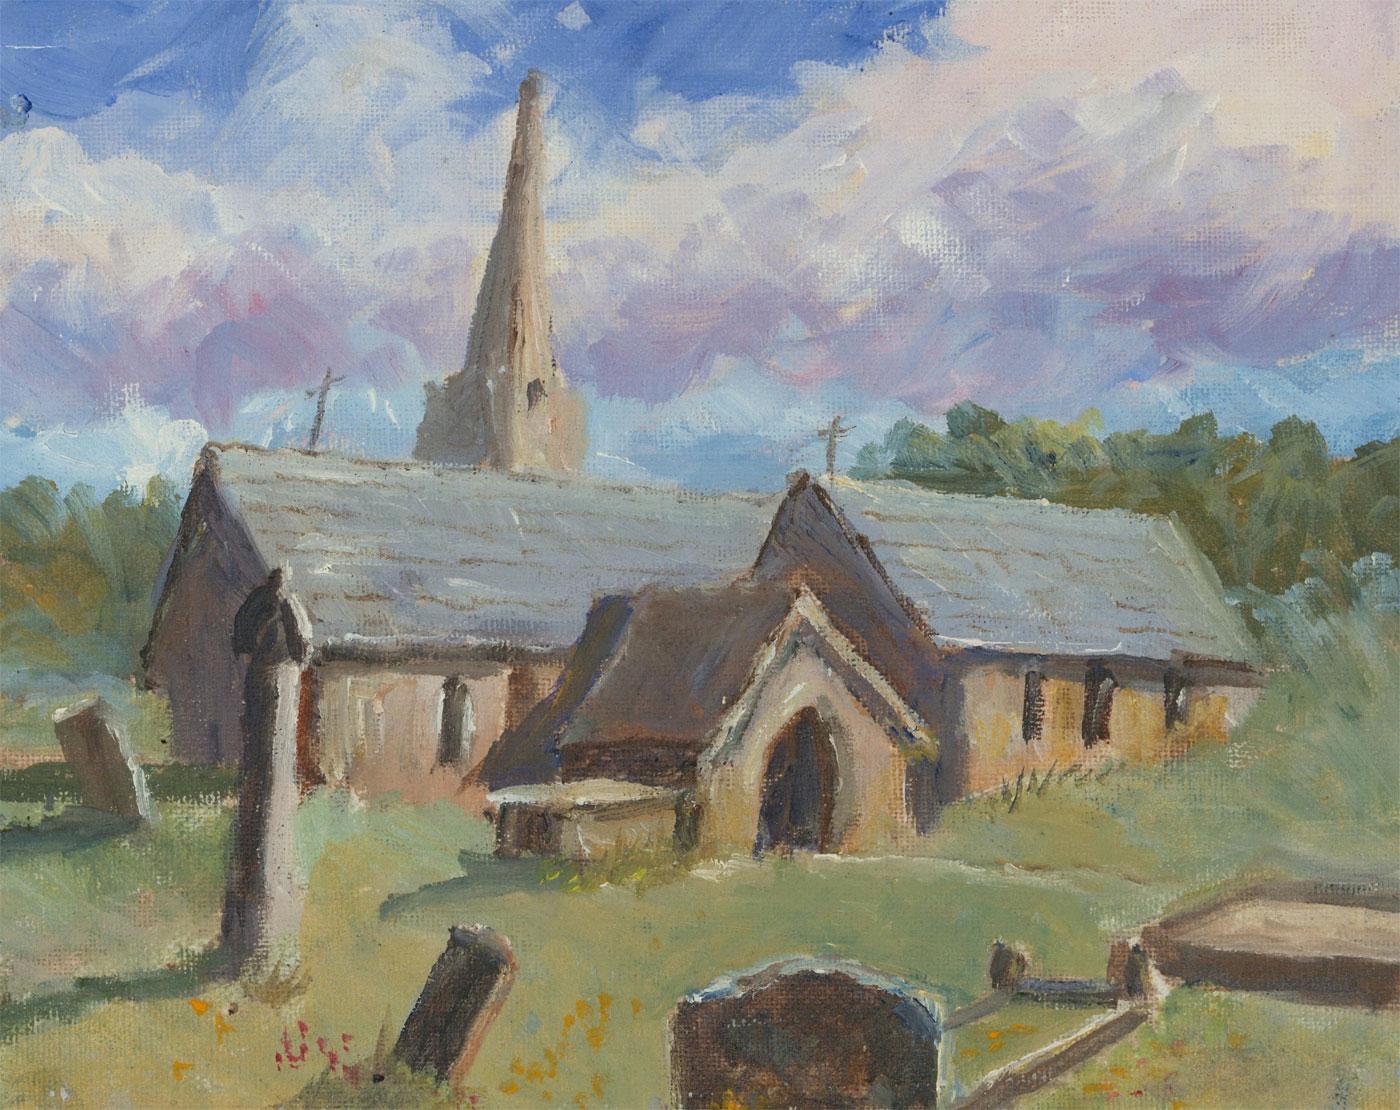 John A. Case - 20th Century Acrylic, Country Church